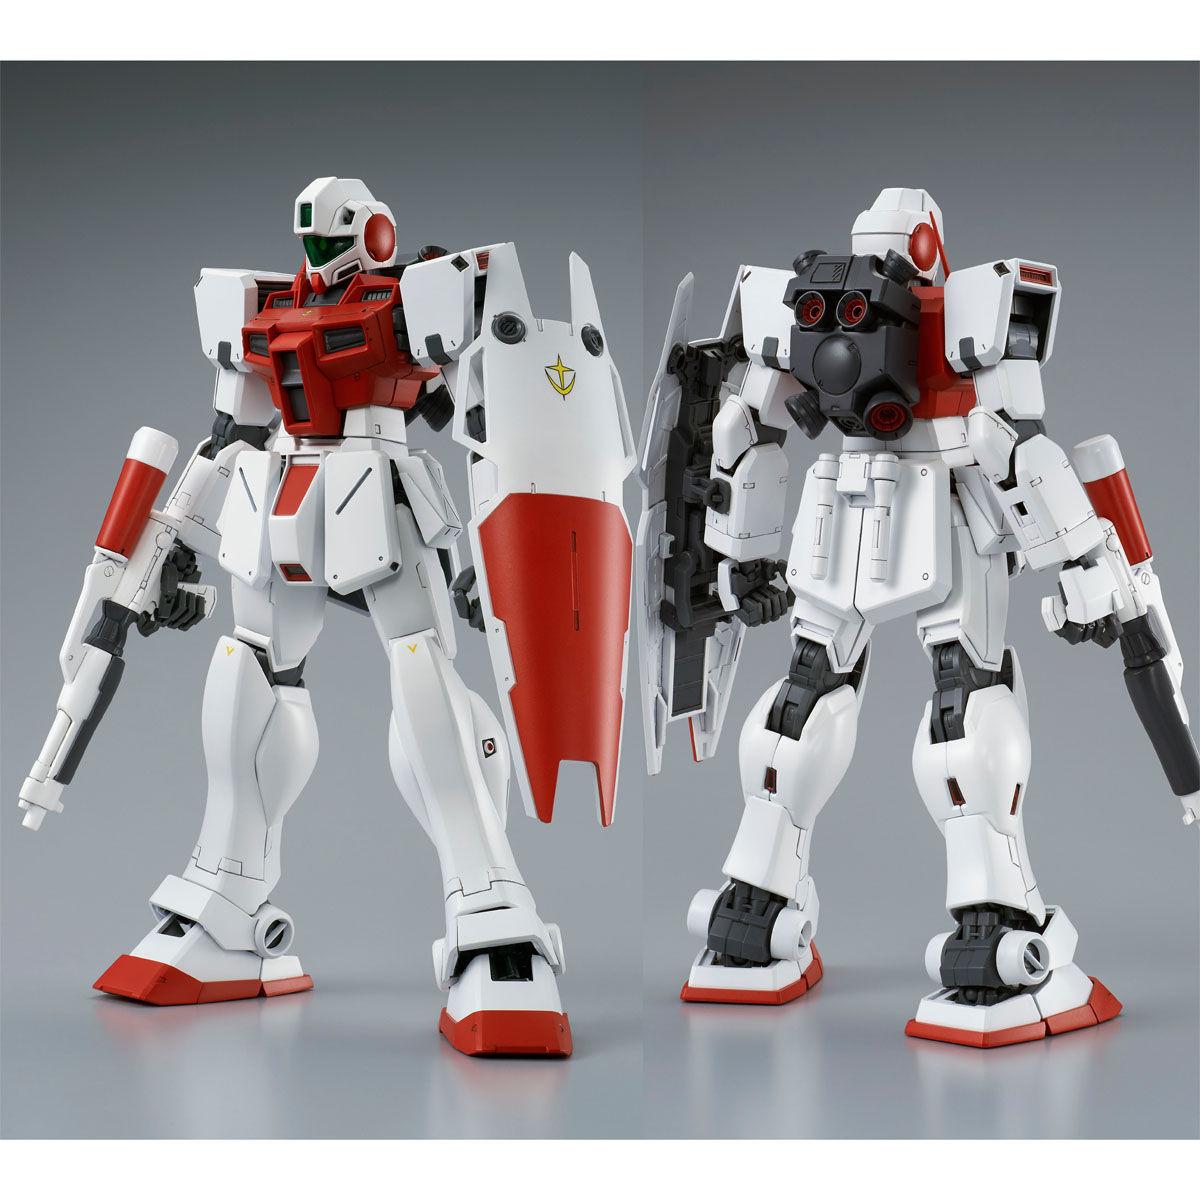 MG 1/100 ジム・コマンド(宇宙戦仕様)